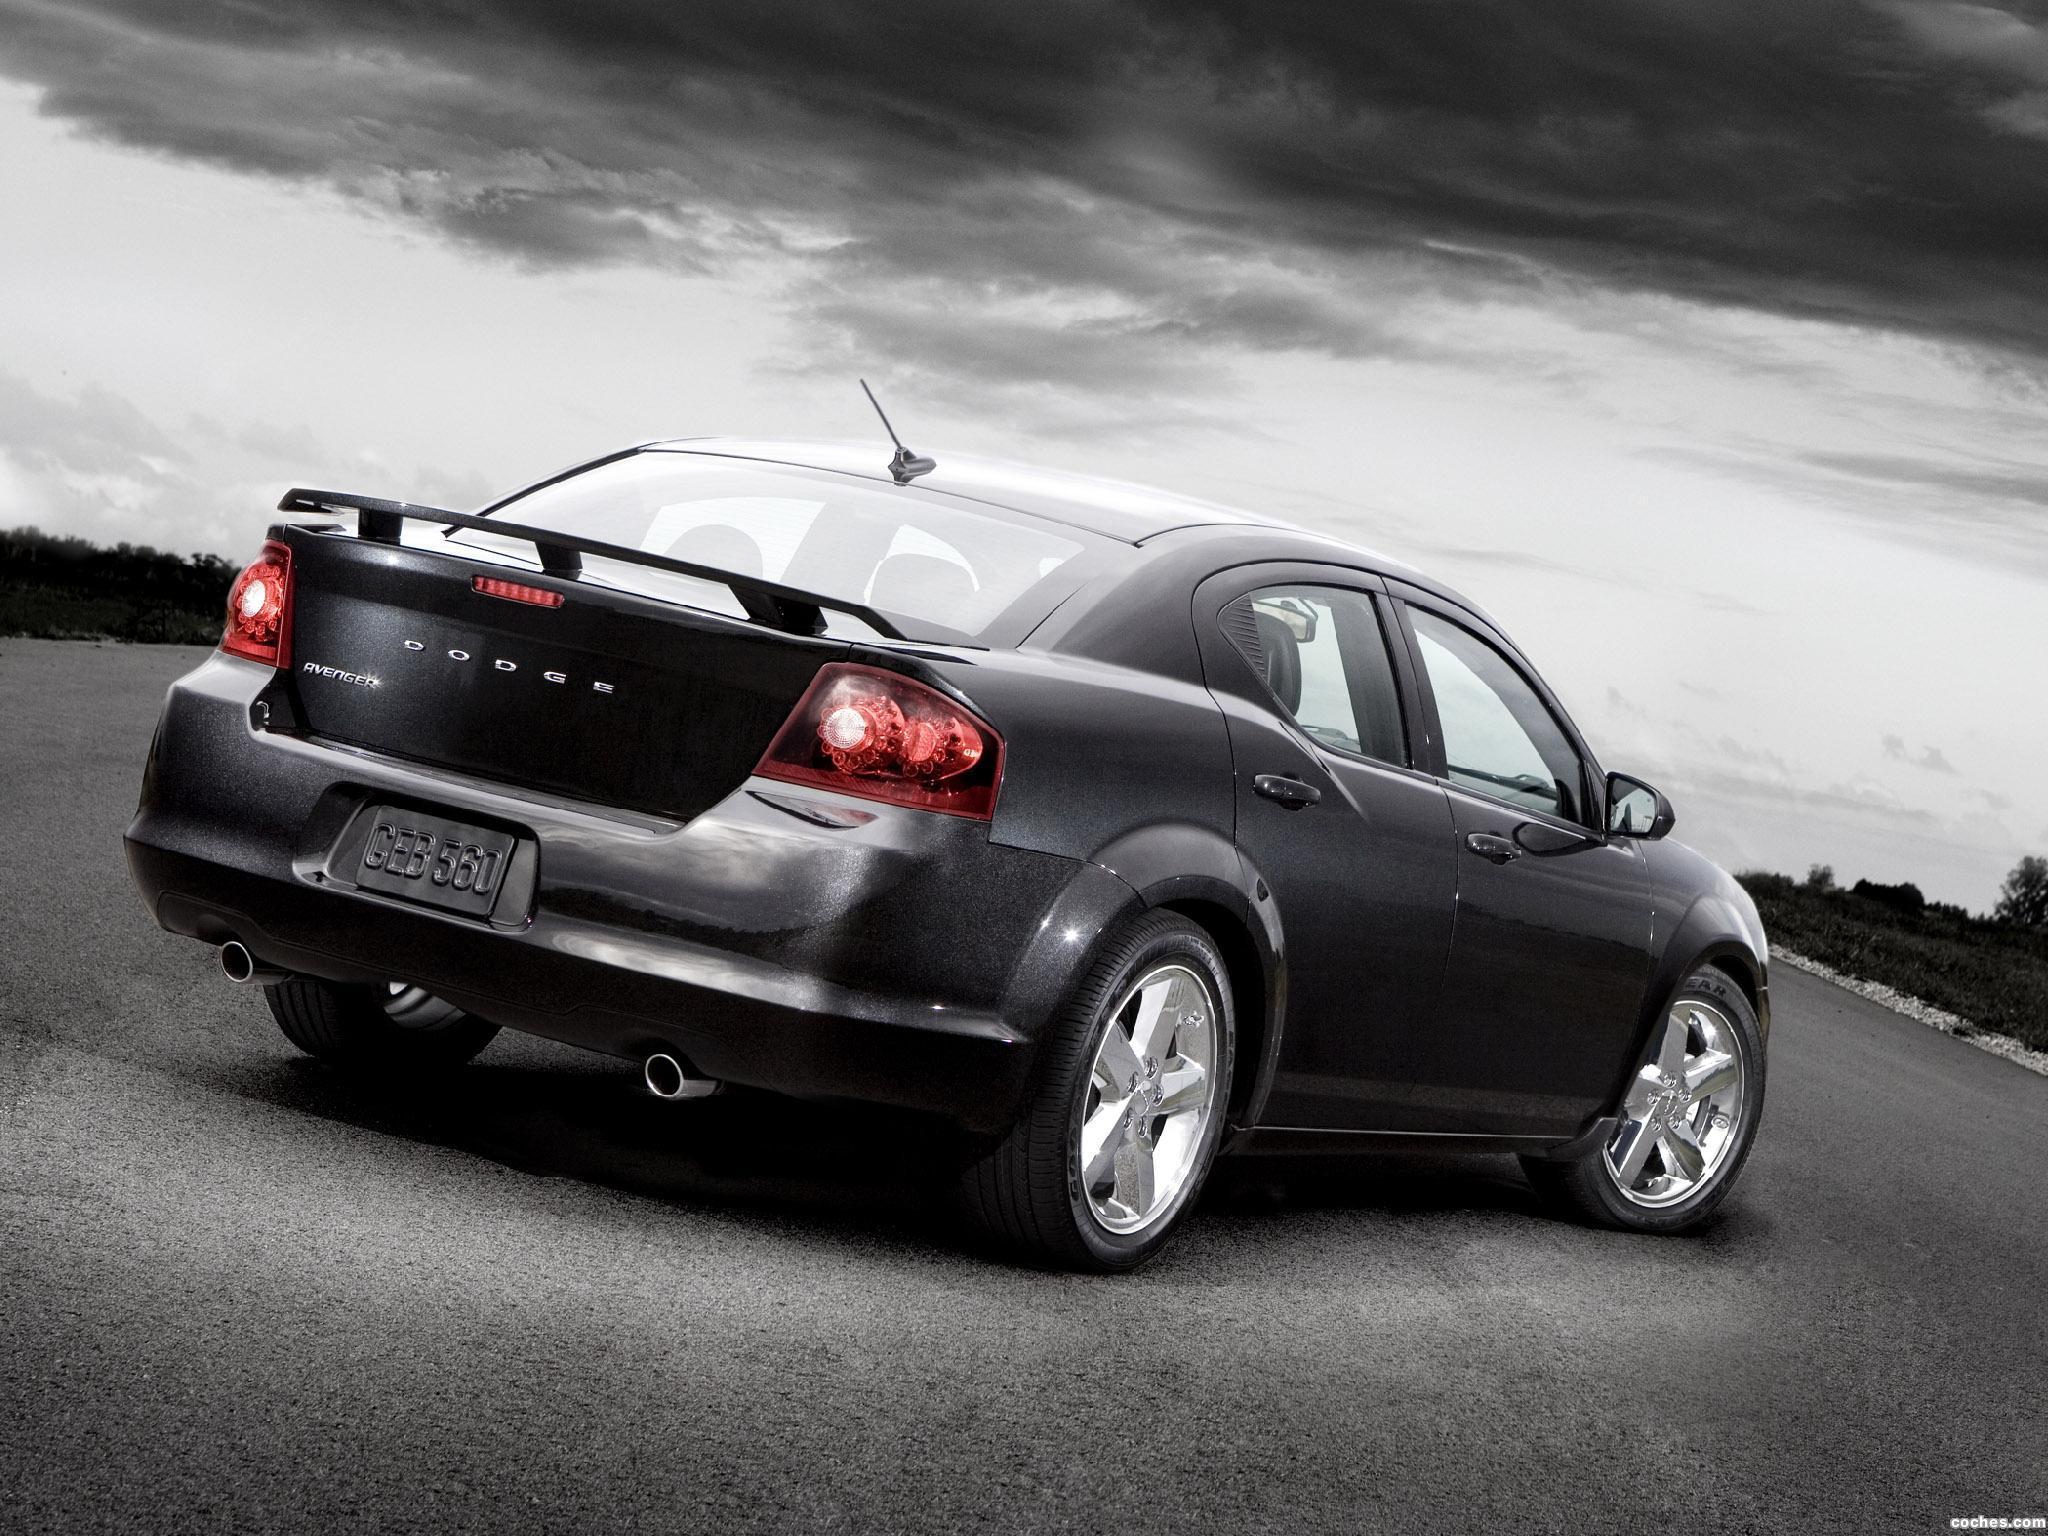 Foto 3 de Dodge Avenger 2010